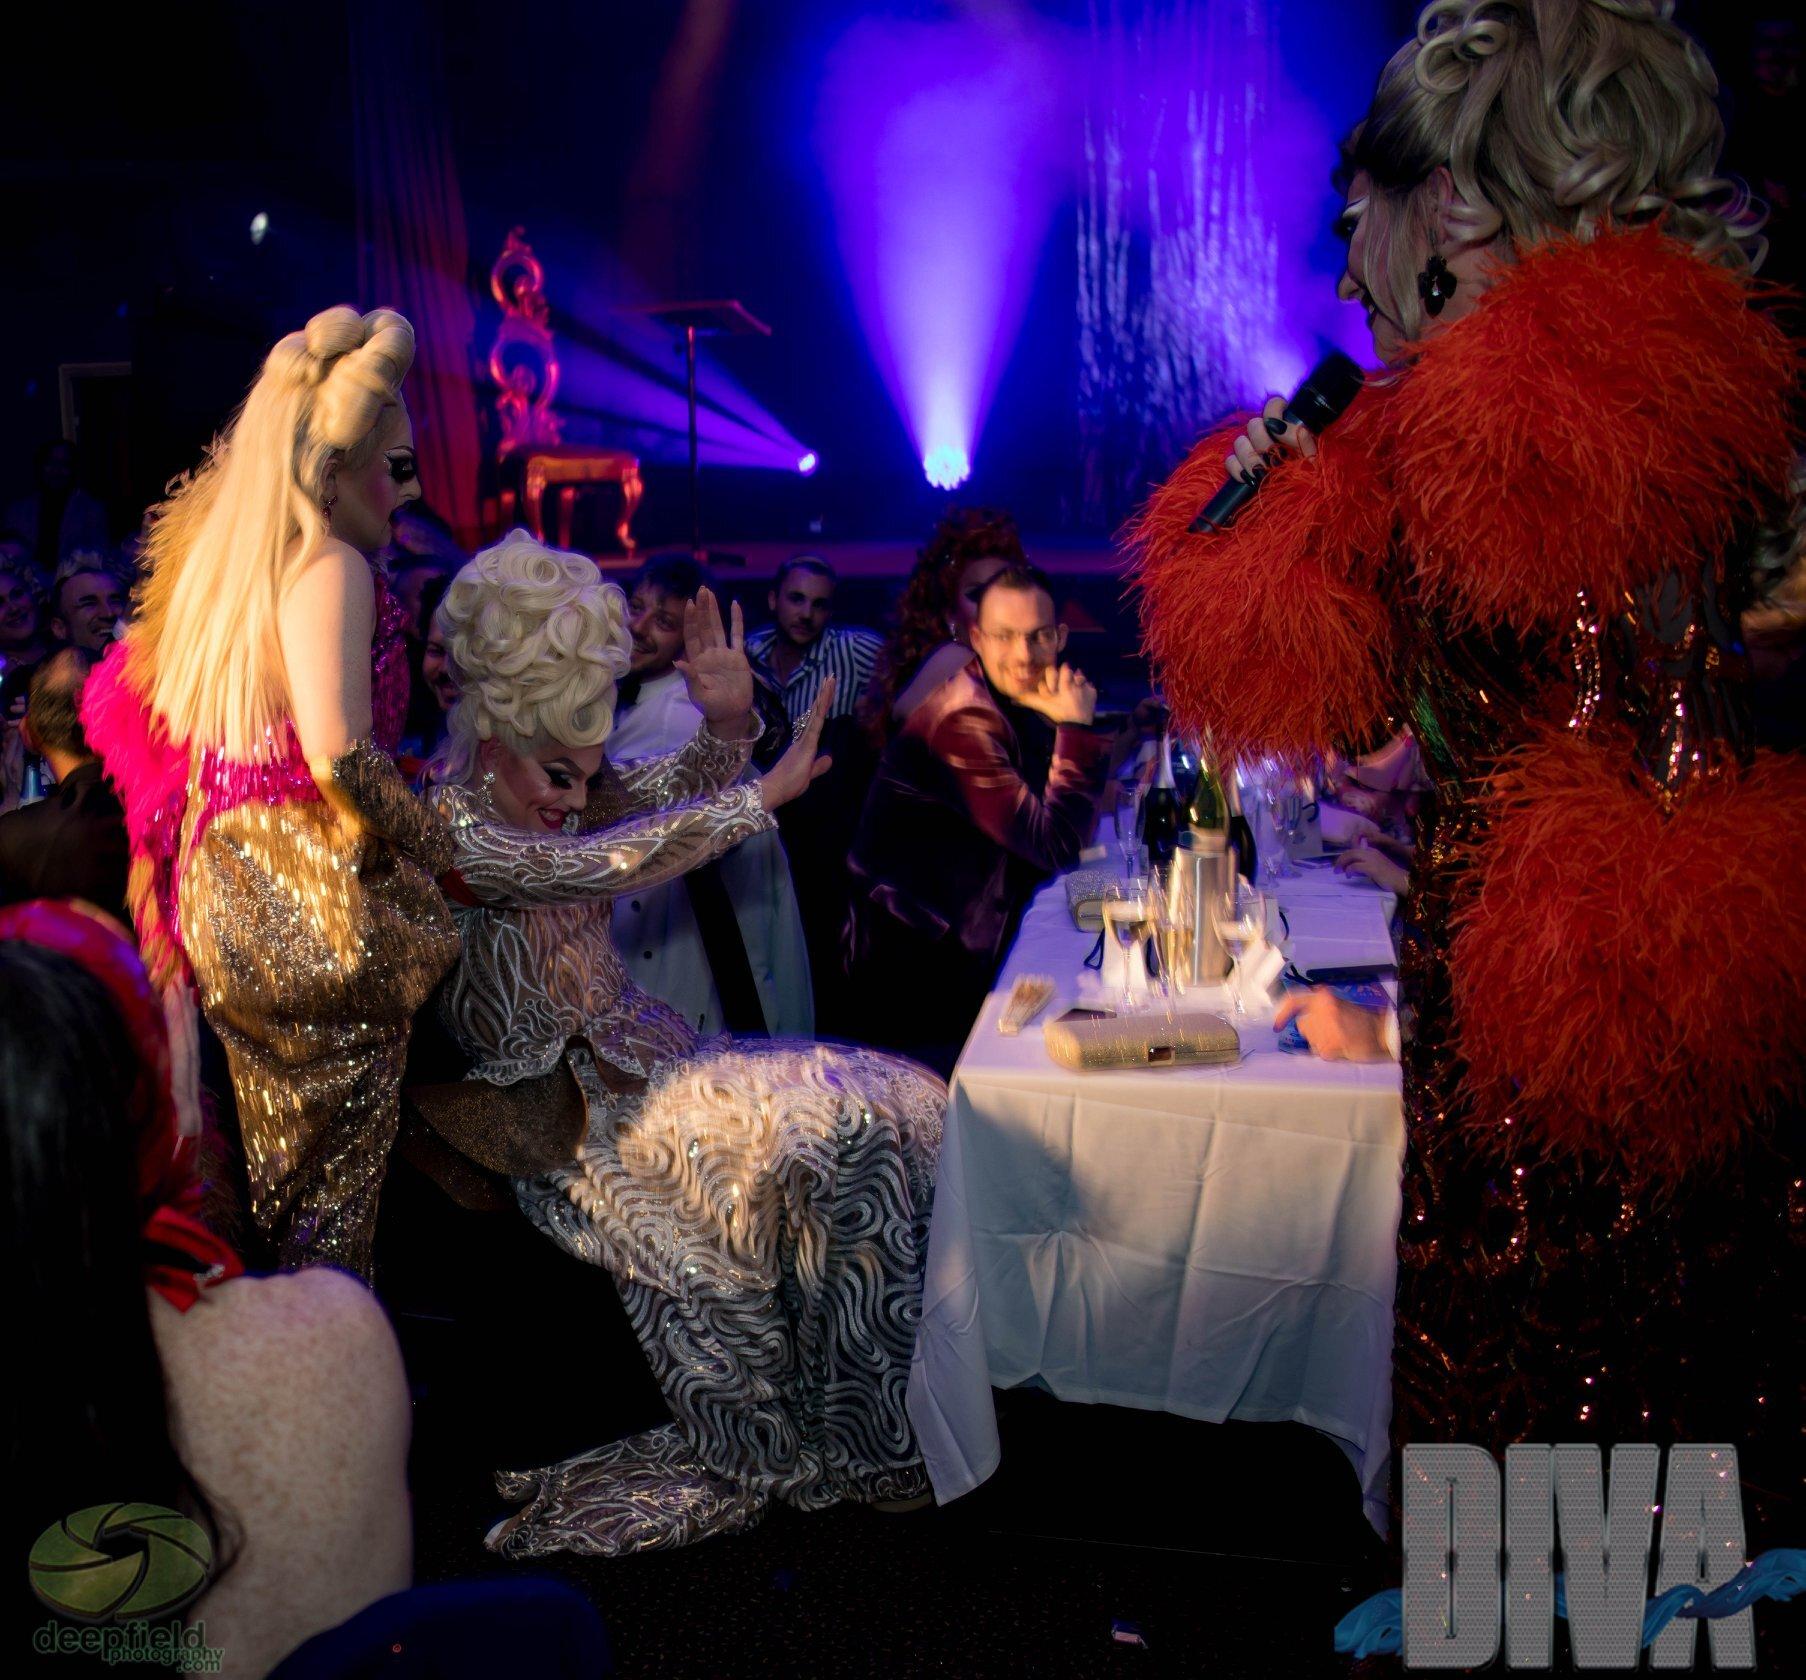 charisma-belle-corporate-host-event-hosting-hannah-conda-carmen-gedditdiva-awards-sydney-drag-queen-royalty-best-hire-drag-race-australia.jpg